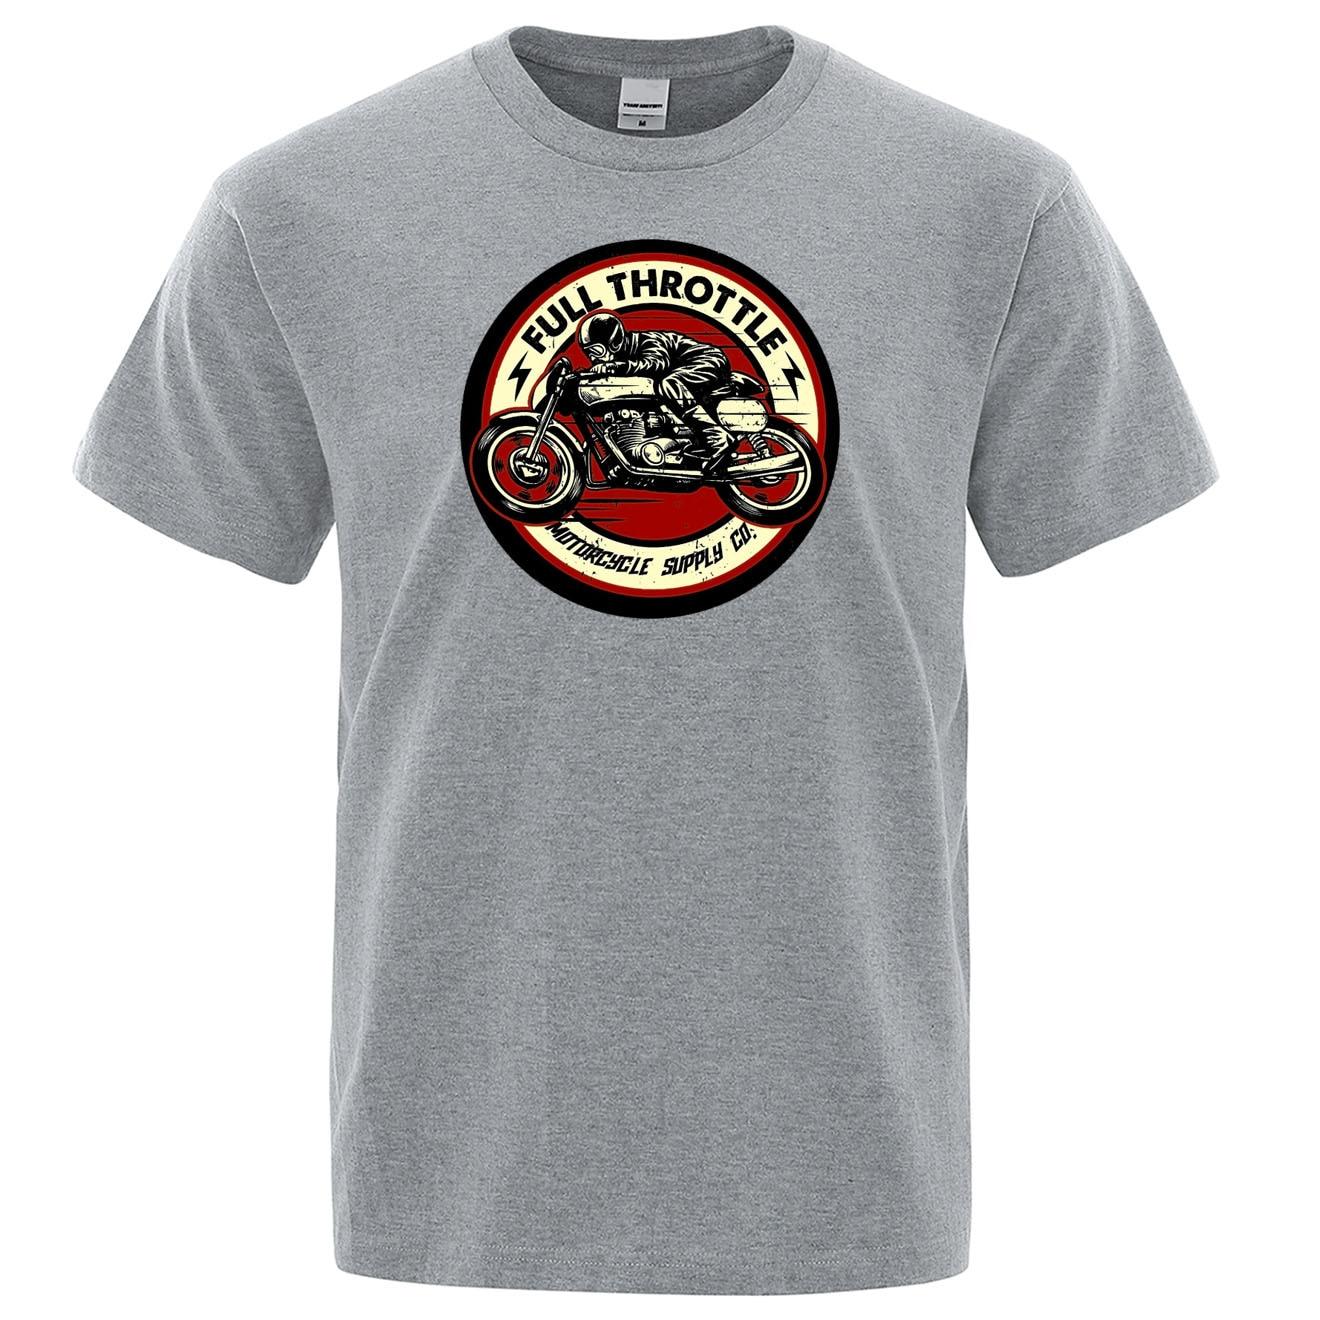 Full Throttle Cafe Racer Rockabilly Biker T Shirts 2019 Summer Cotton Tshirt Casual Brand Streetwear Harajuku Fashion T-shirts